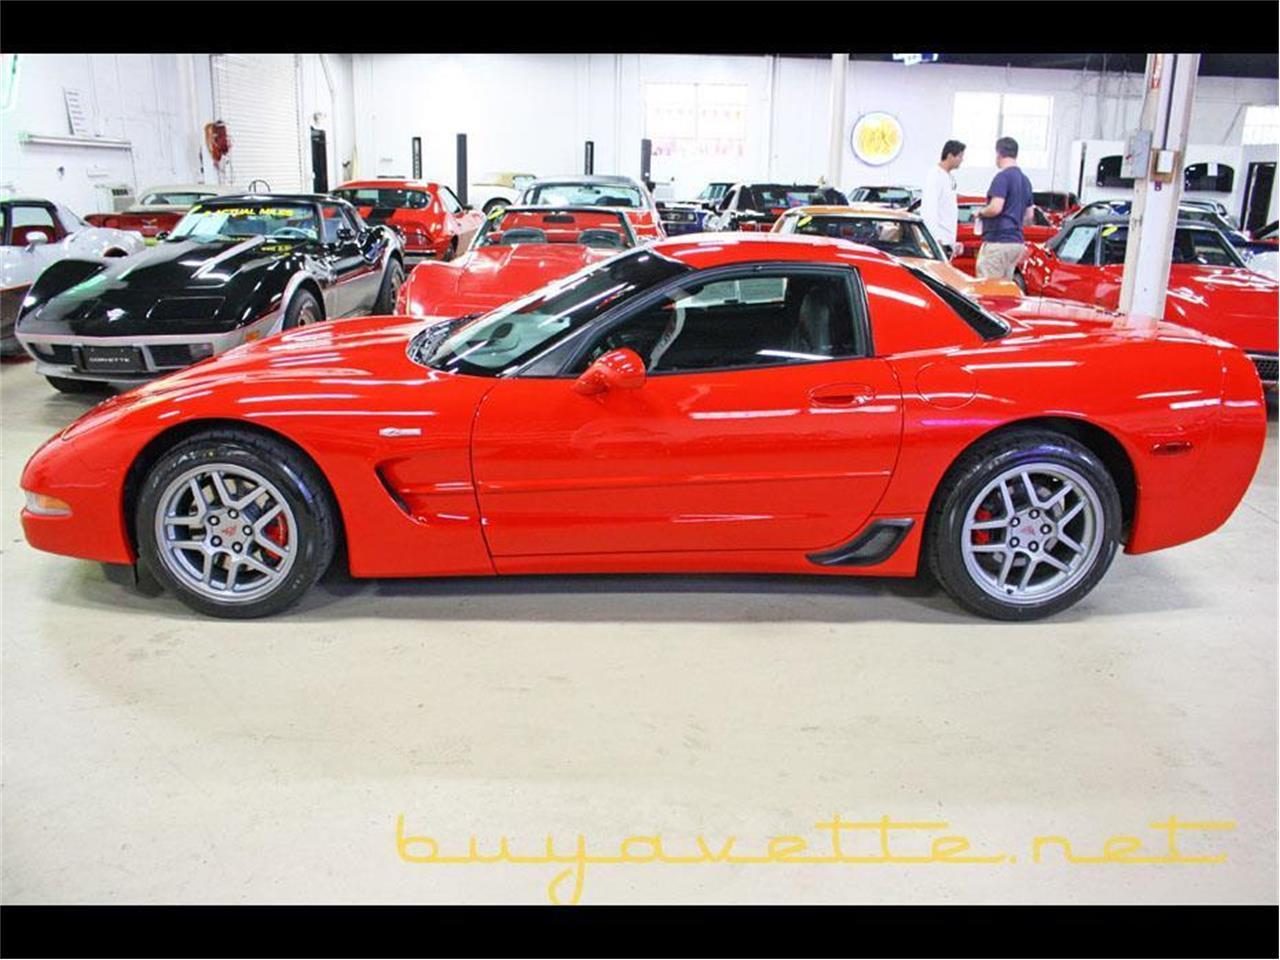 Large Picture of '02 Chevrolet Corvette located in Georgia - $25,999.00 - PZEY